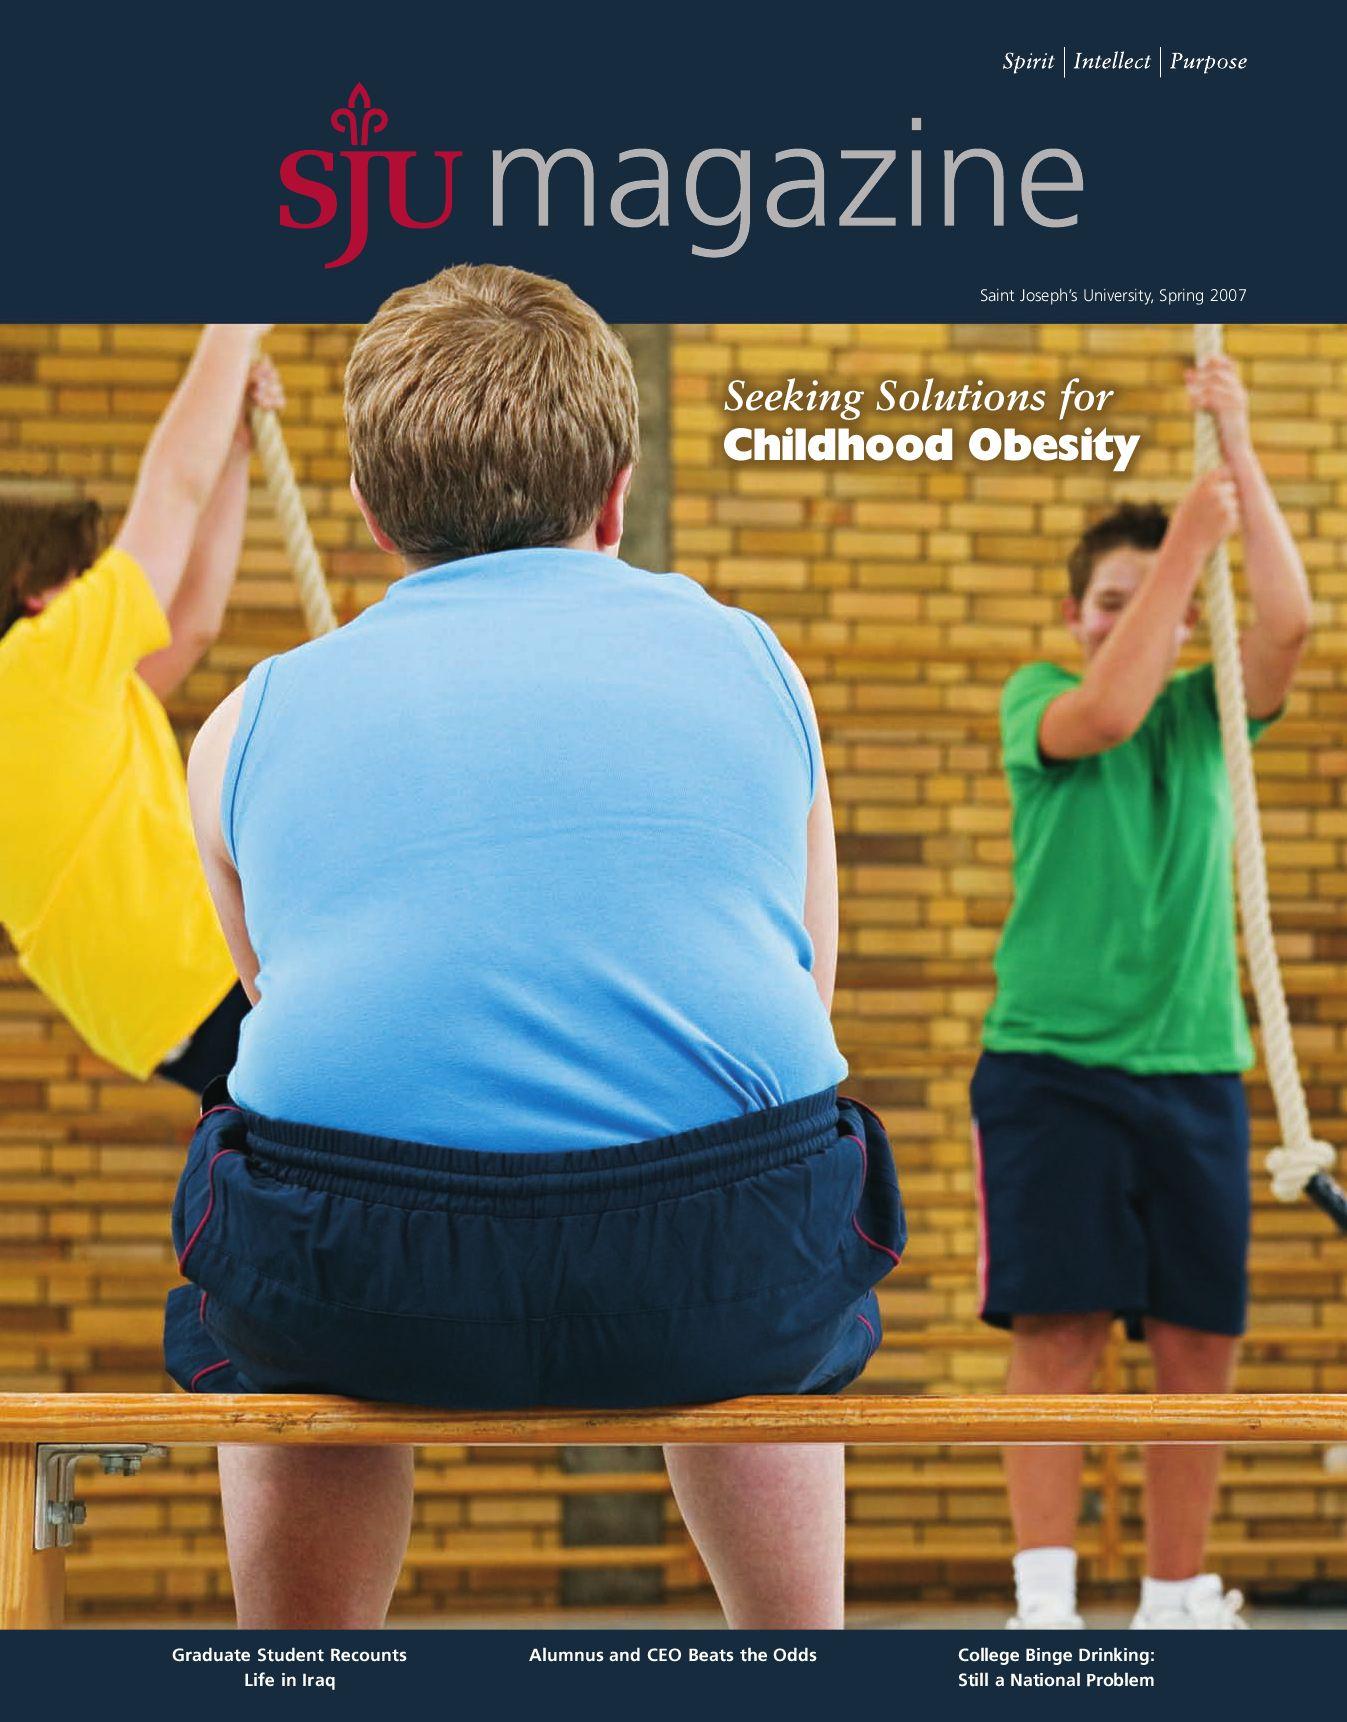 332e7908f0 SJU Magazine - Spring 2007 by Saint Joseph s University - Issuu